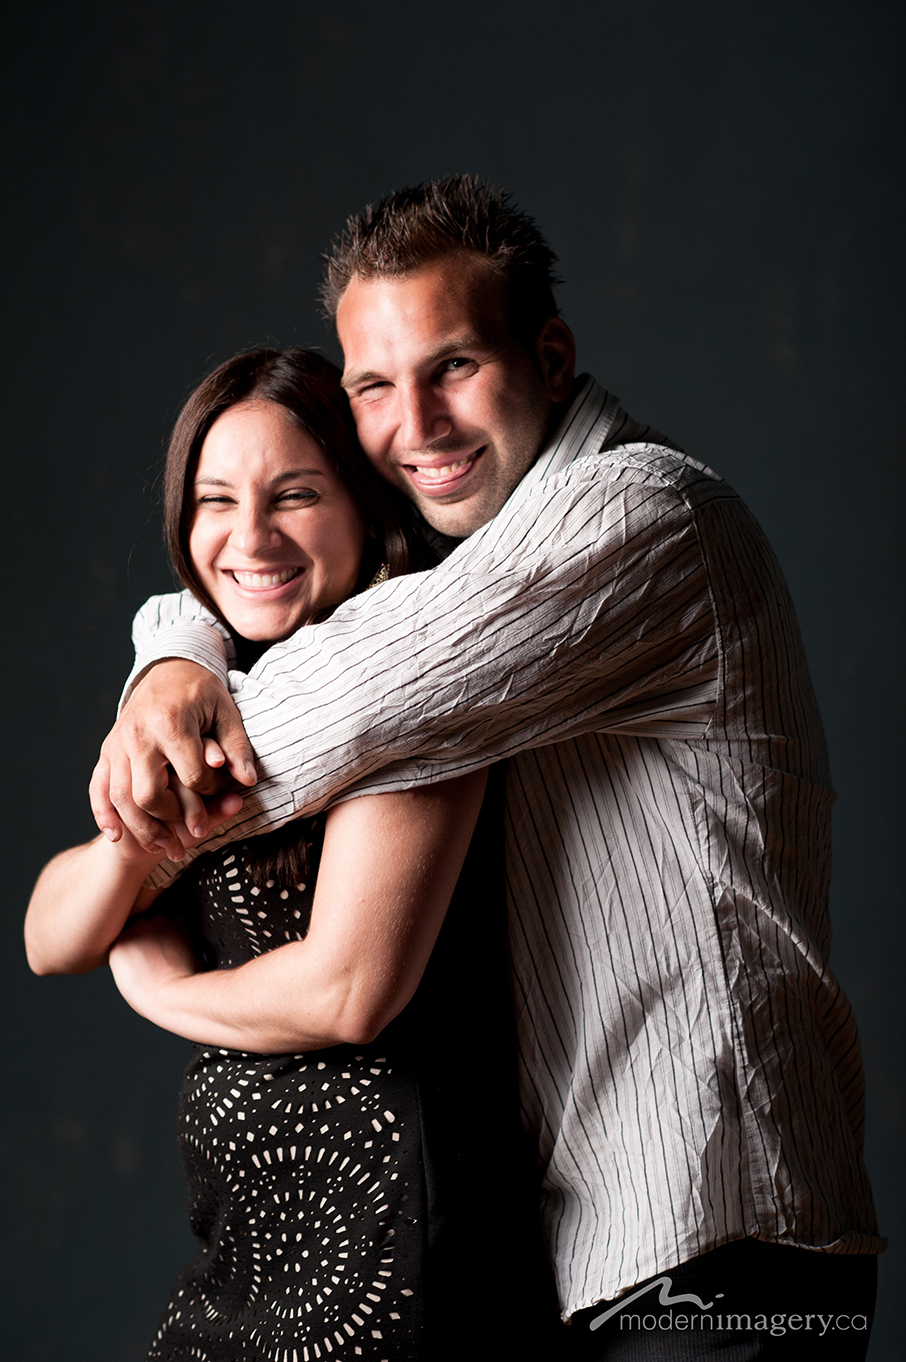 Rita&Tomasso-52.jpg